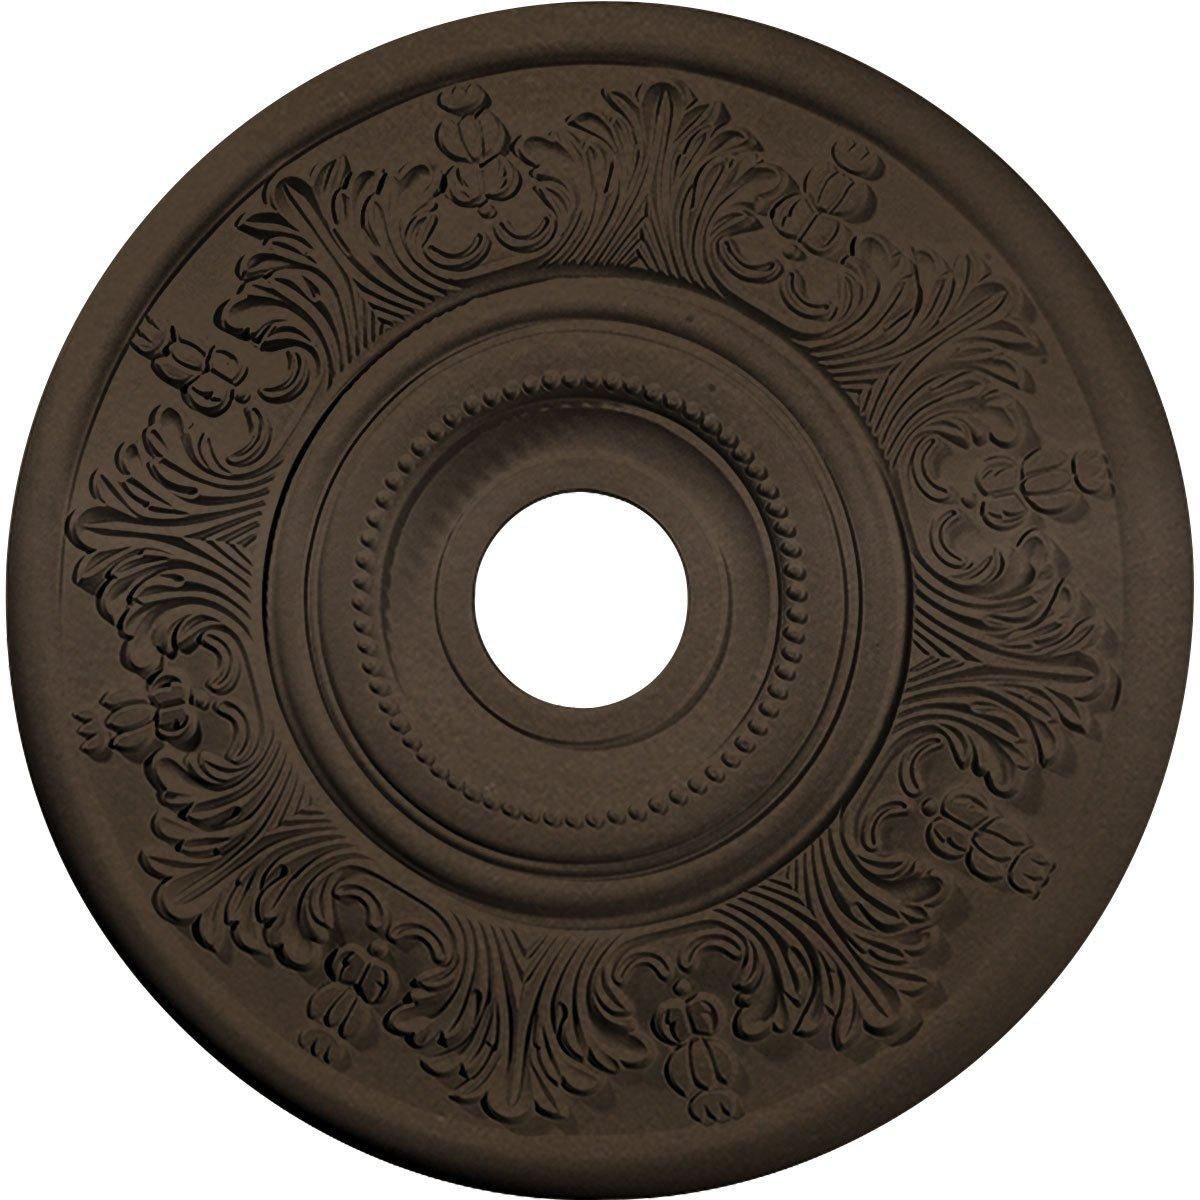 Ekena Millwork CM20VIBZS Vienna Ceiling Medallion, 20''OD x 3 1/2''ID x 1 1/2''P, Bronze